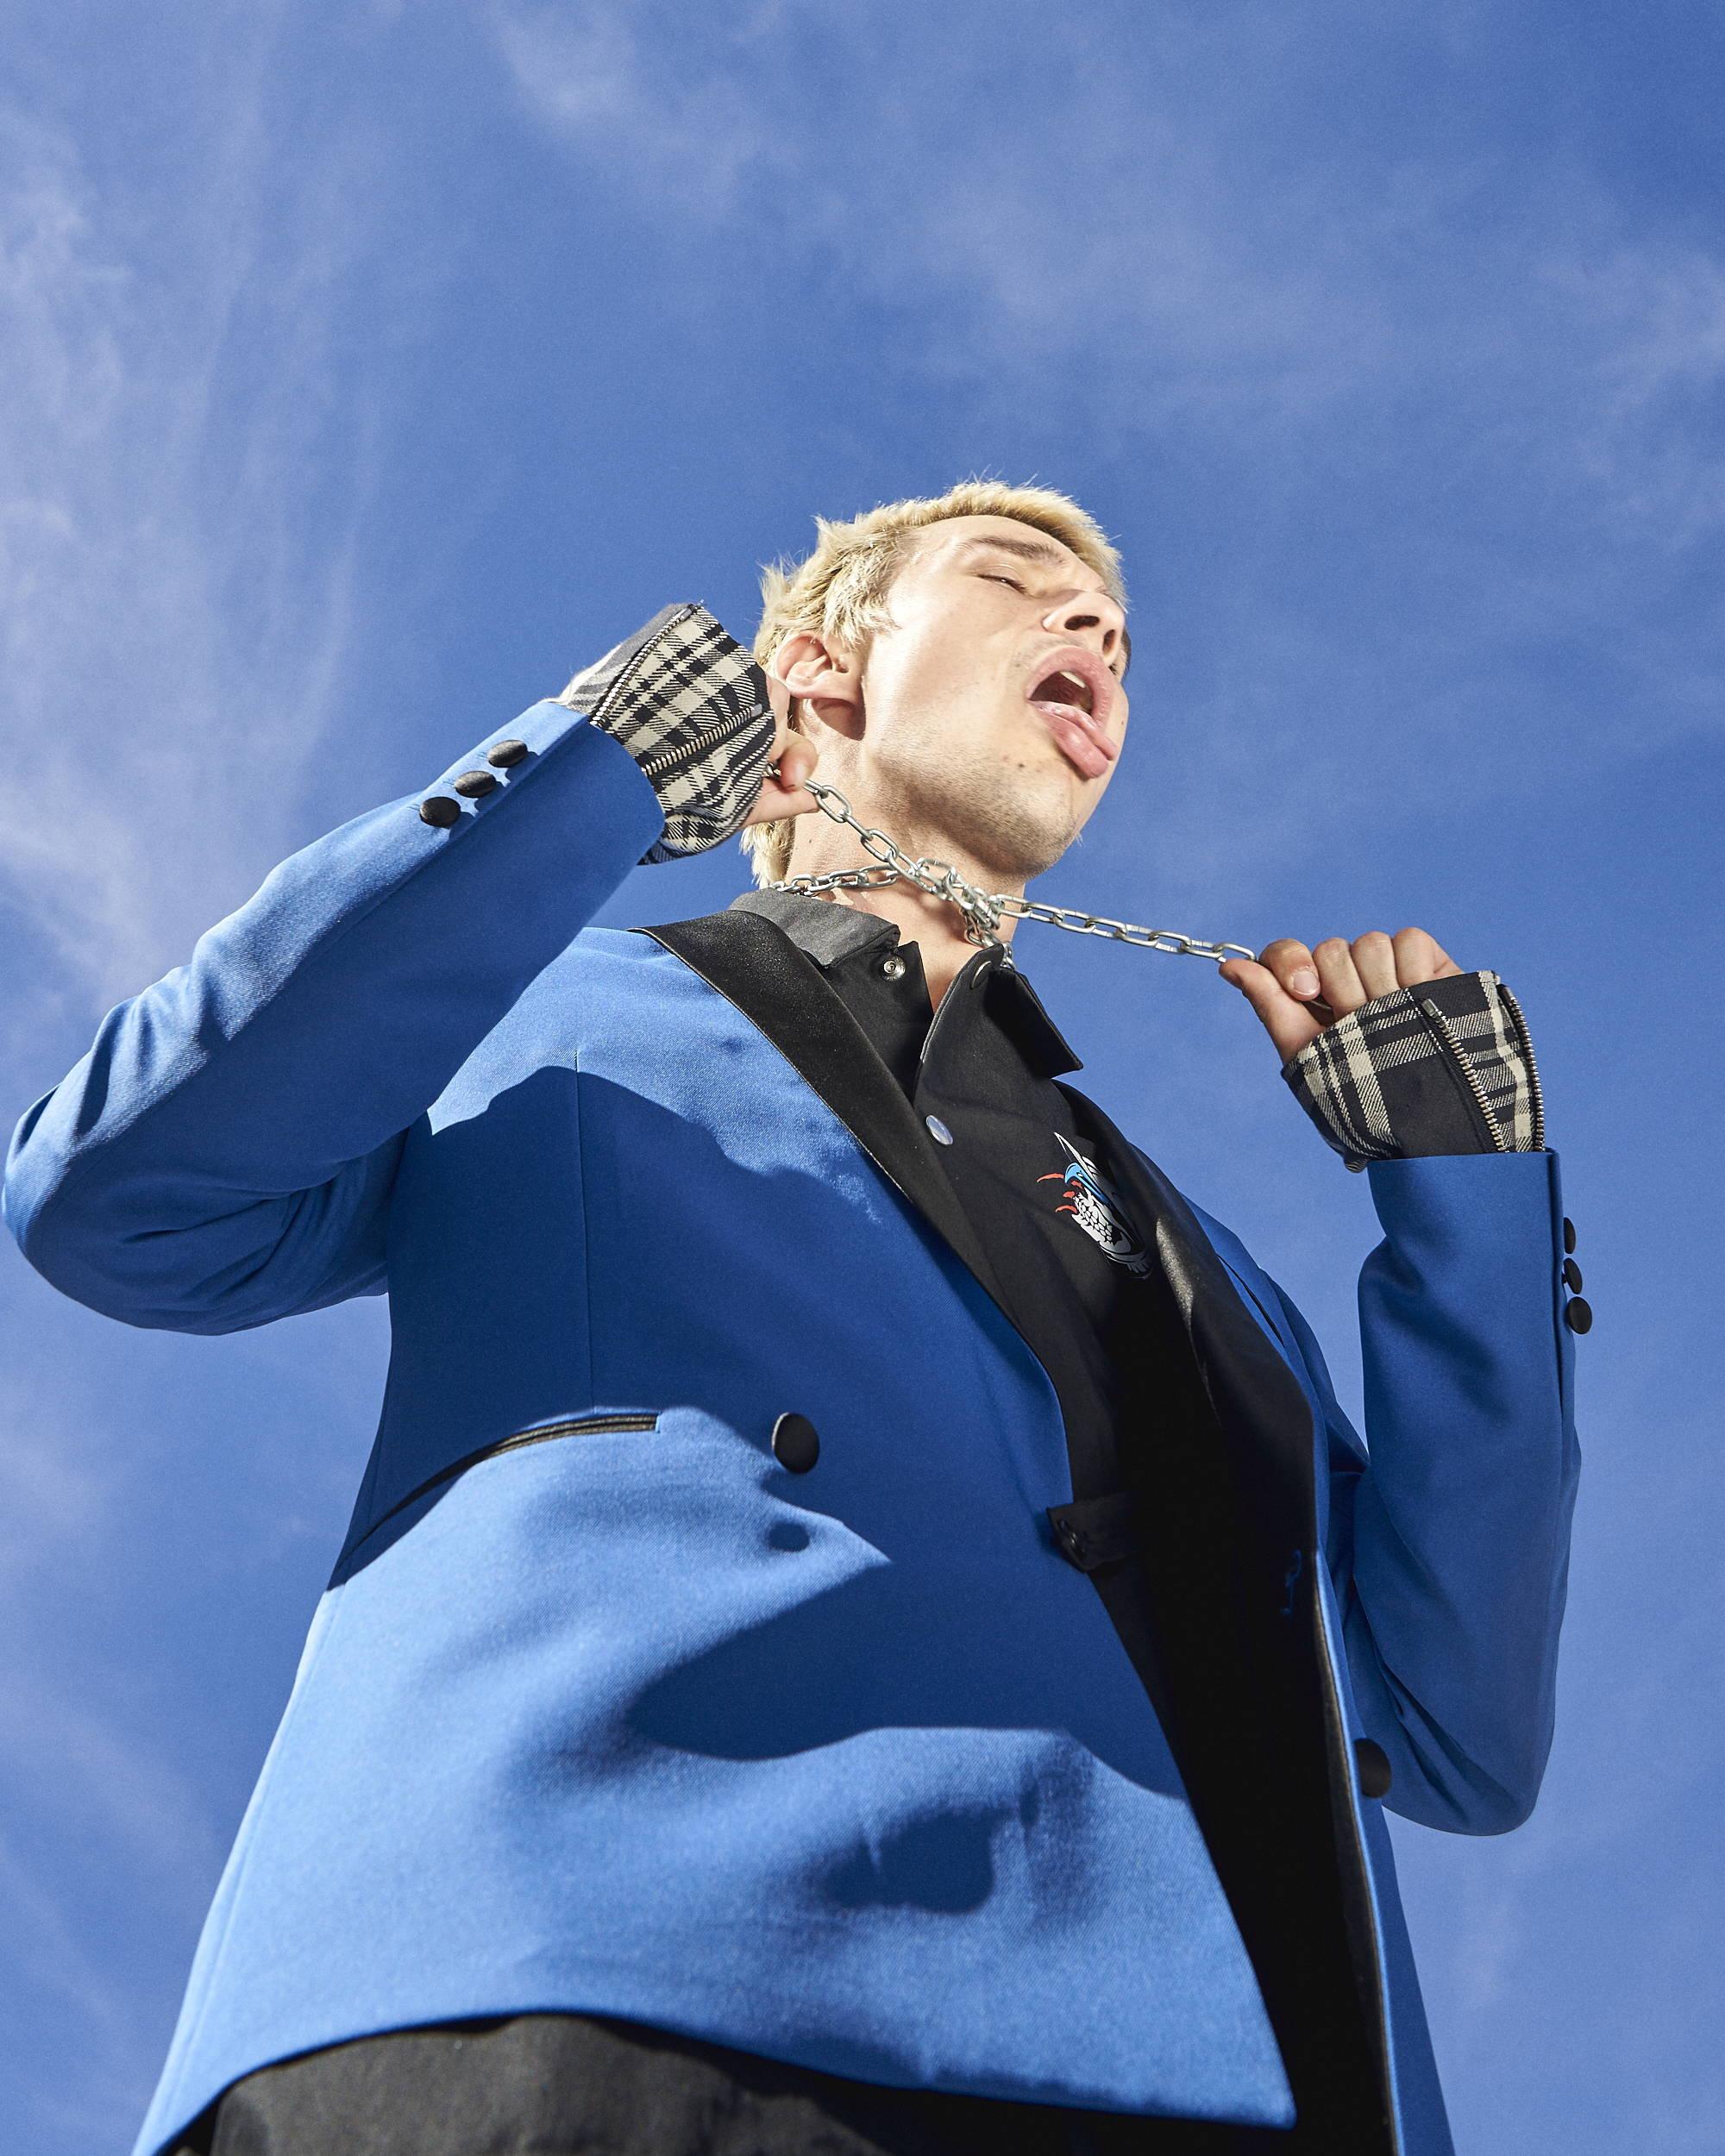 Kidill F/W18 Blue Suit - Hlorenzo